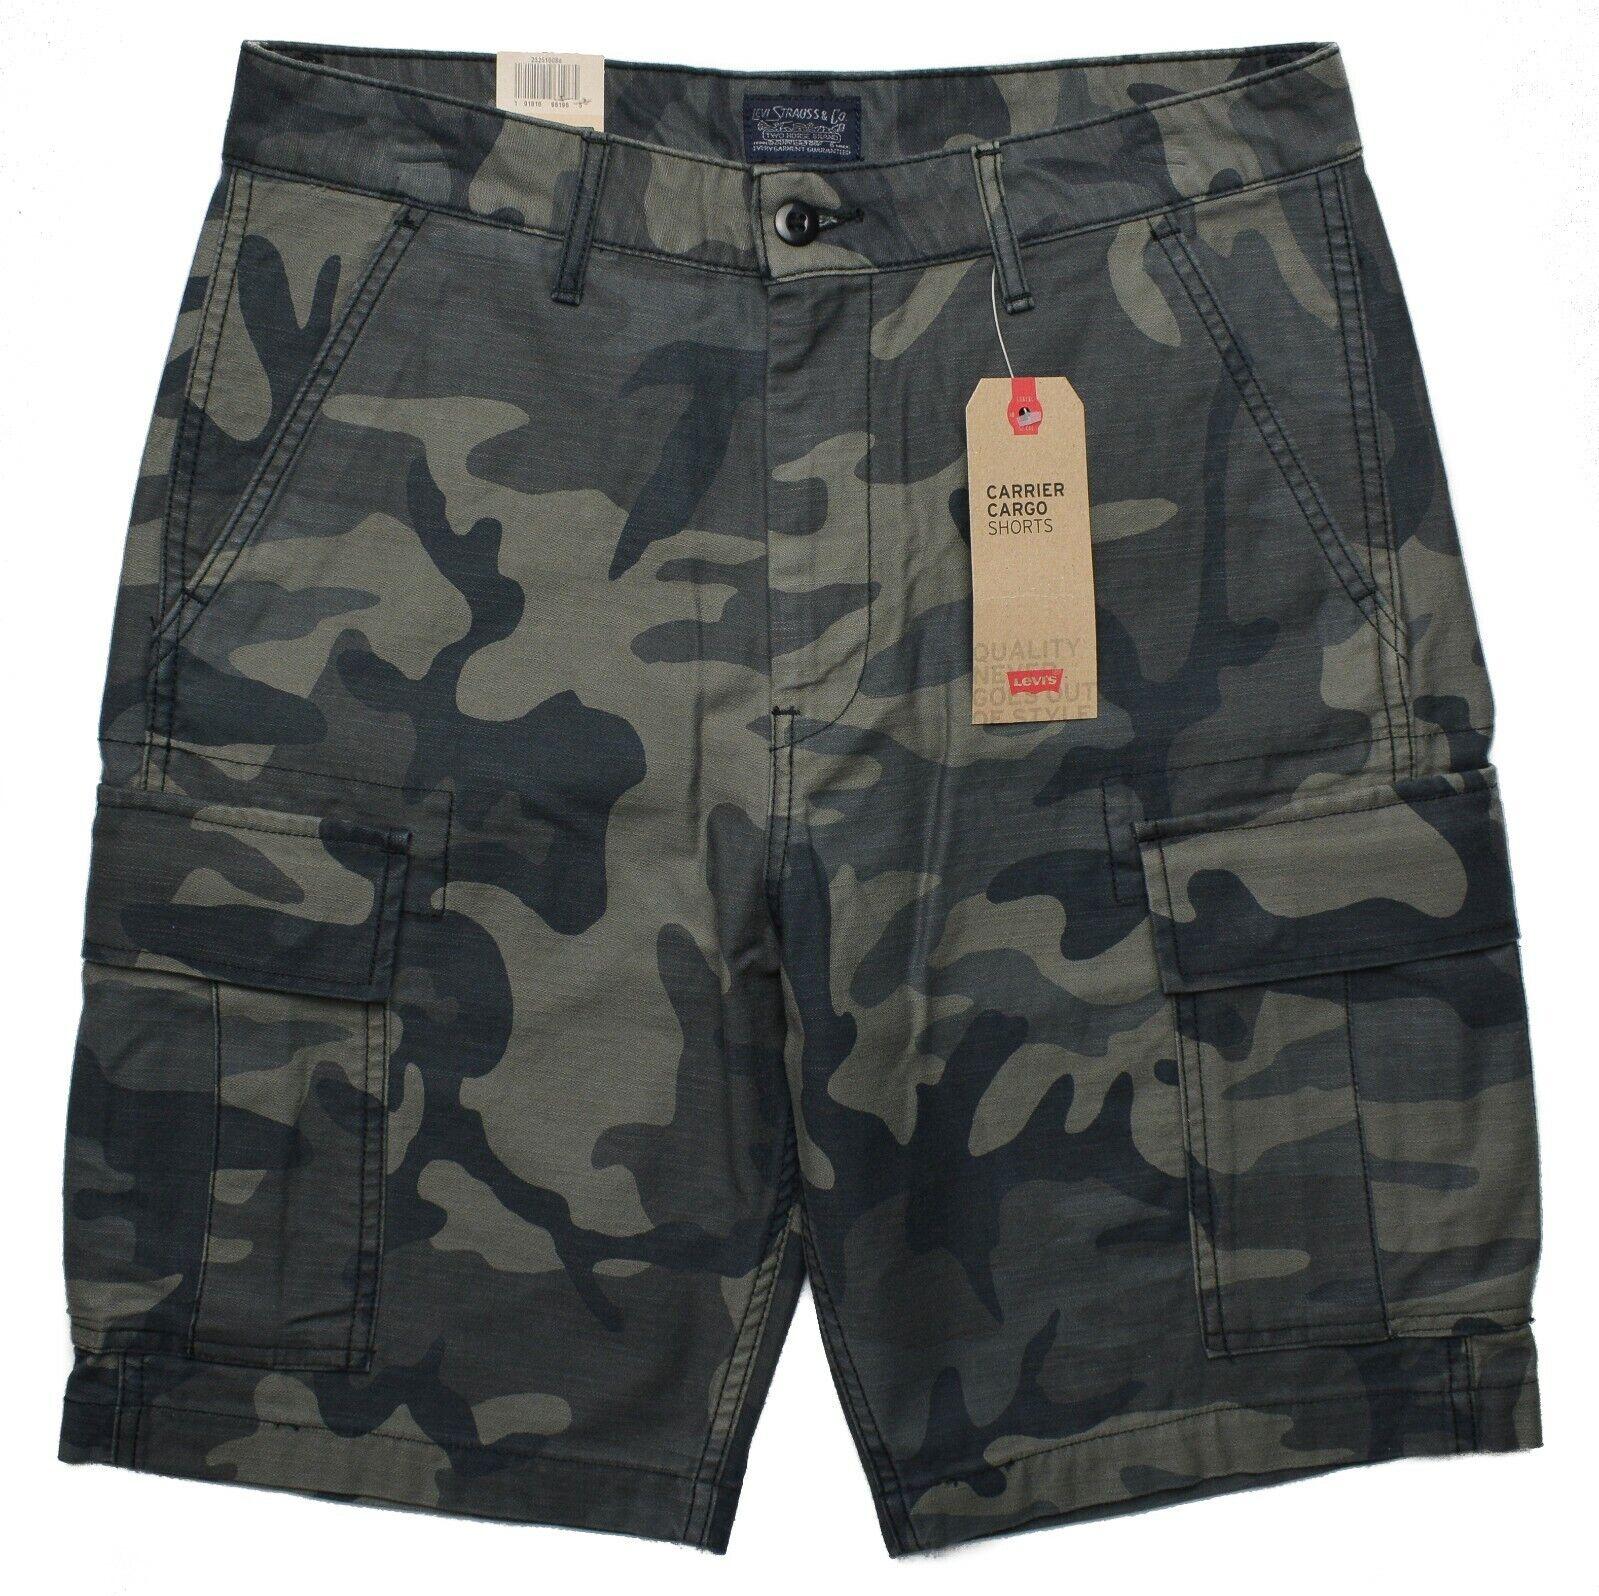 Levi's #10103 NEW Men's Camouflage 100% Cotton Carrier Cargo